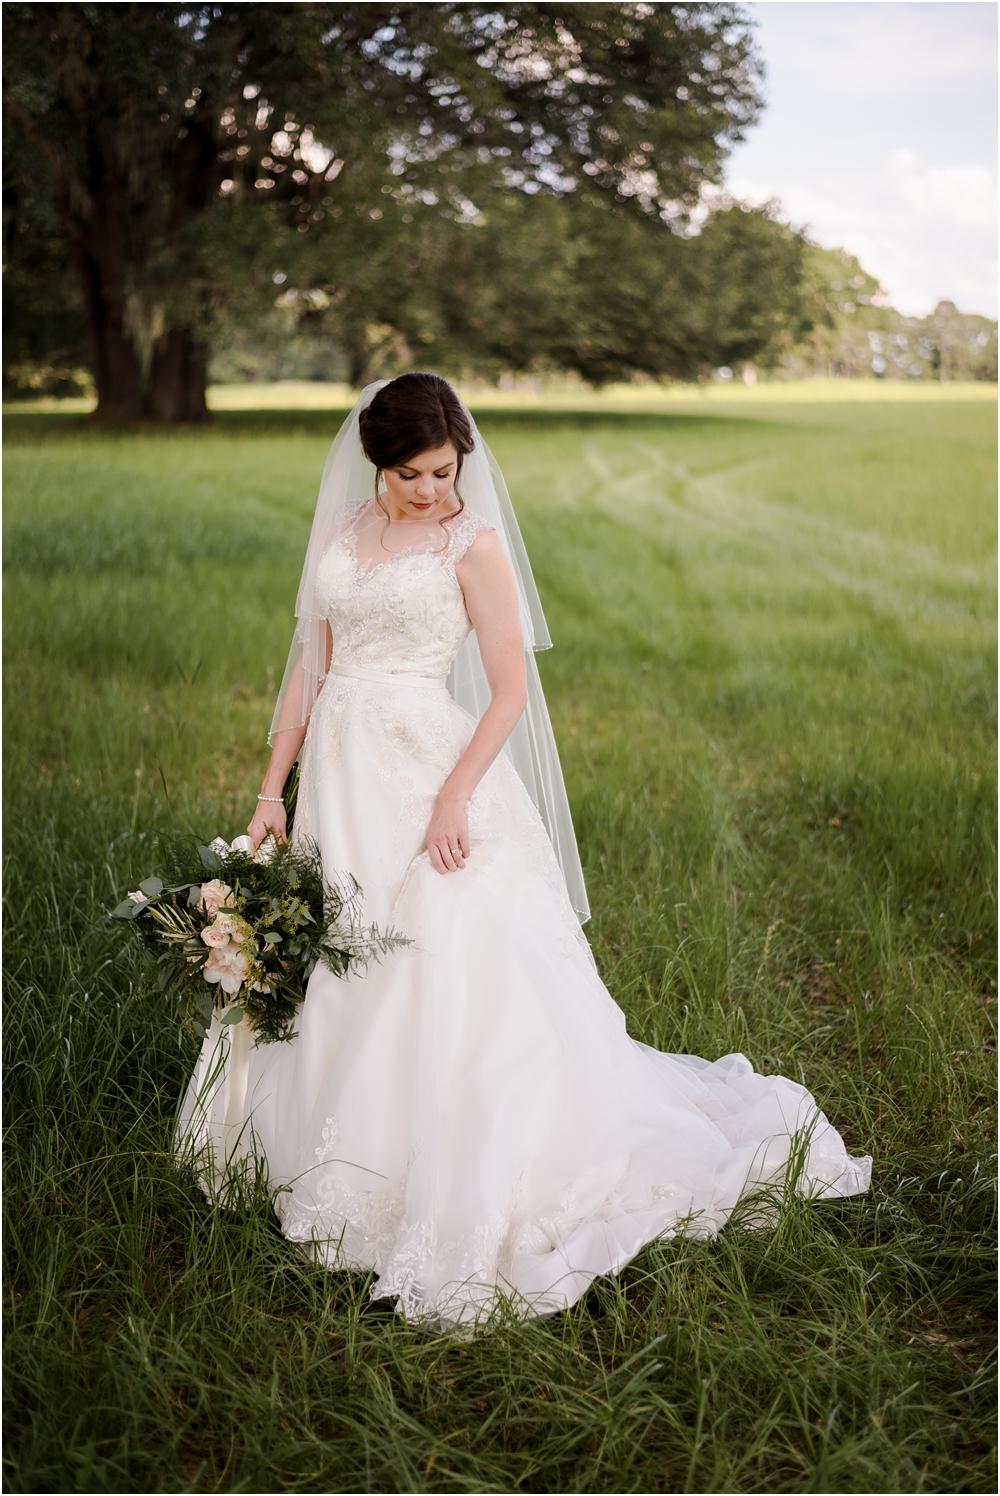 marianna-florida-wedding-photographer-kiersten-grant-36.jpg